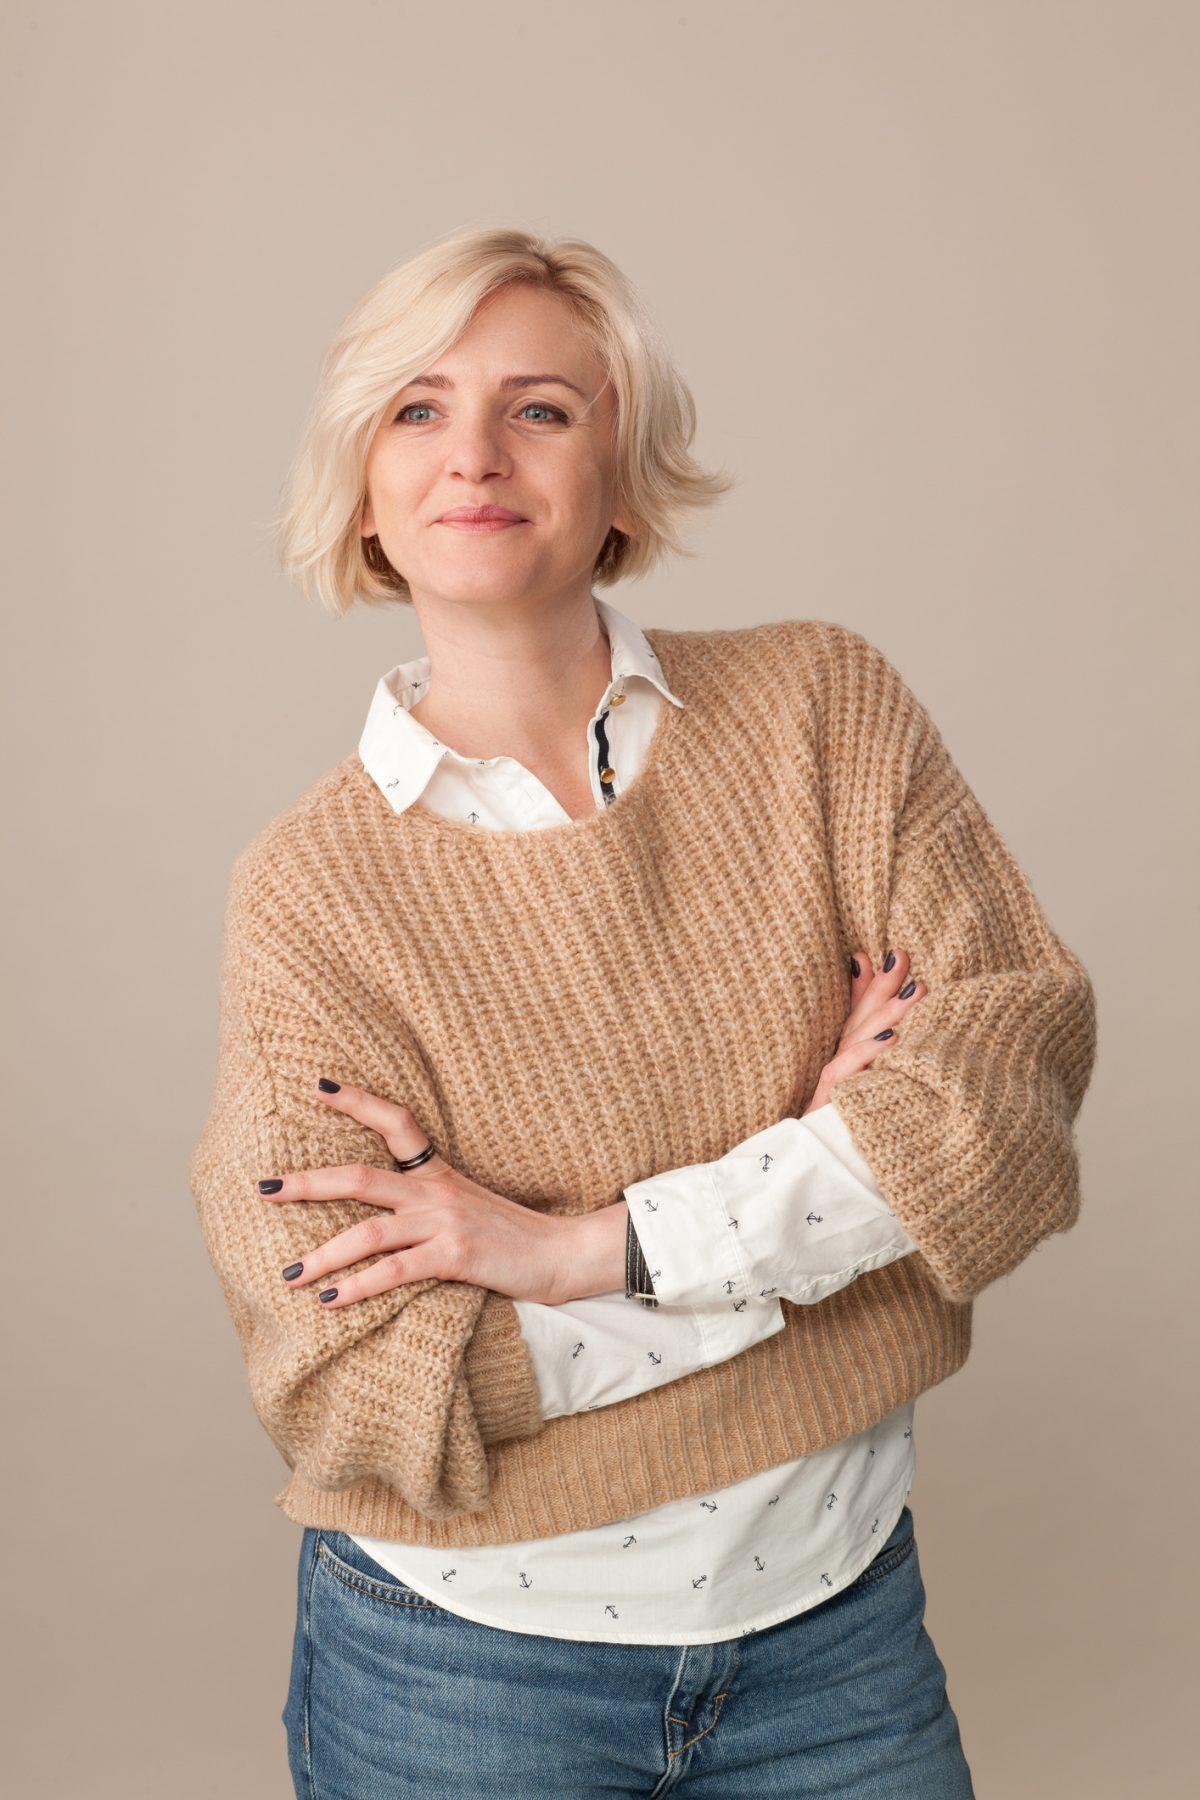 Clothing Shirt Sweater Woman